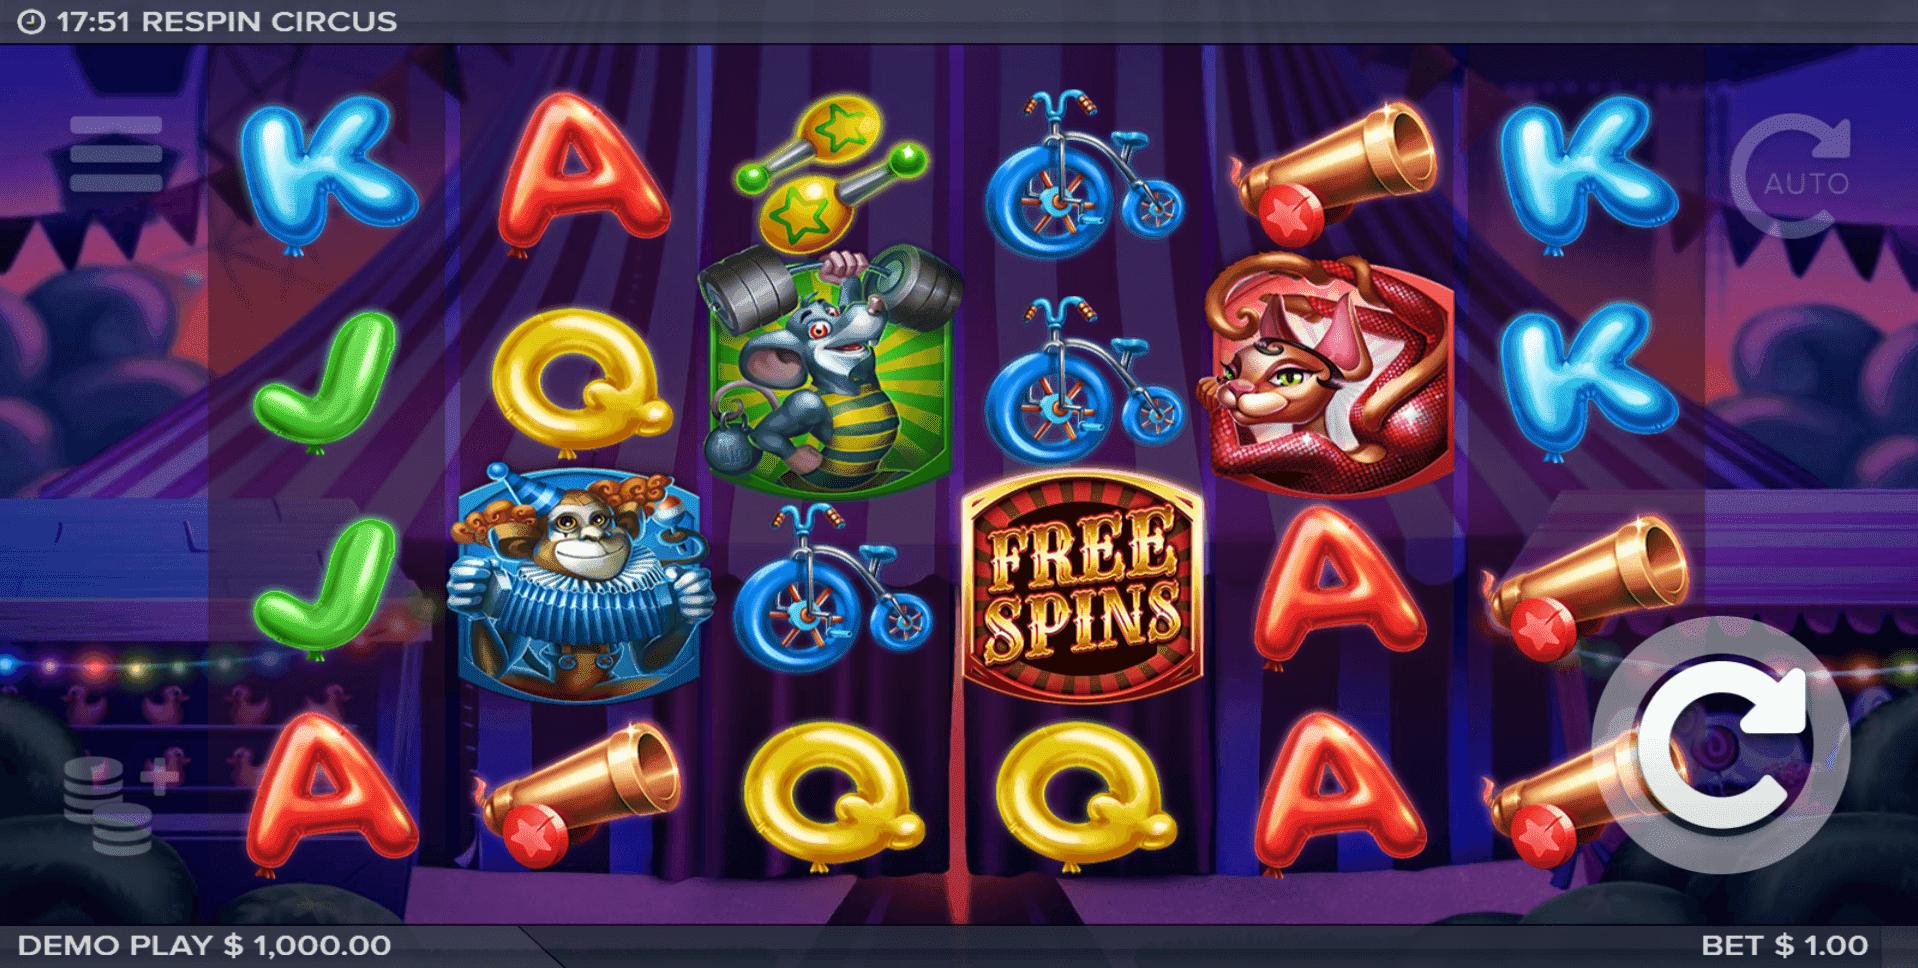 Respin Circus slot machine screenshot